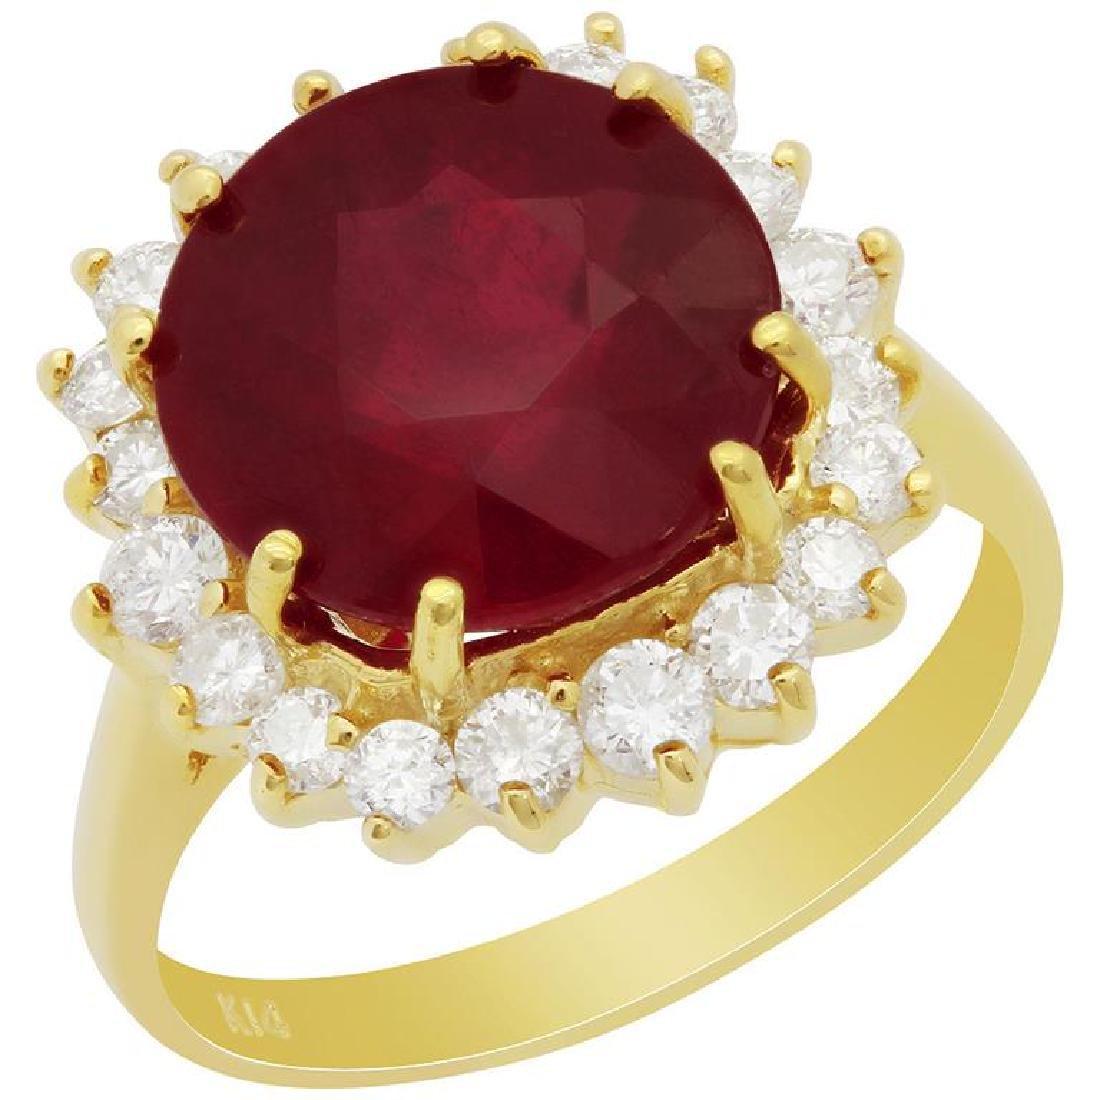 14k Yellow Gold 7.13ct Ruby 0.86ct Diamond Ring